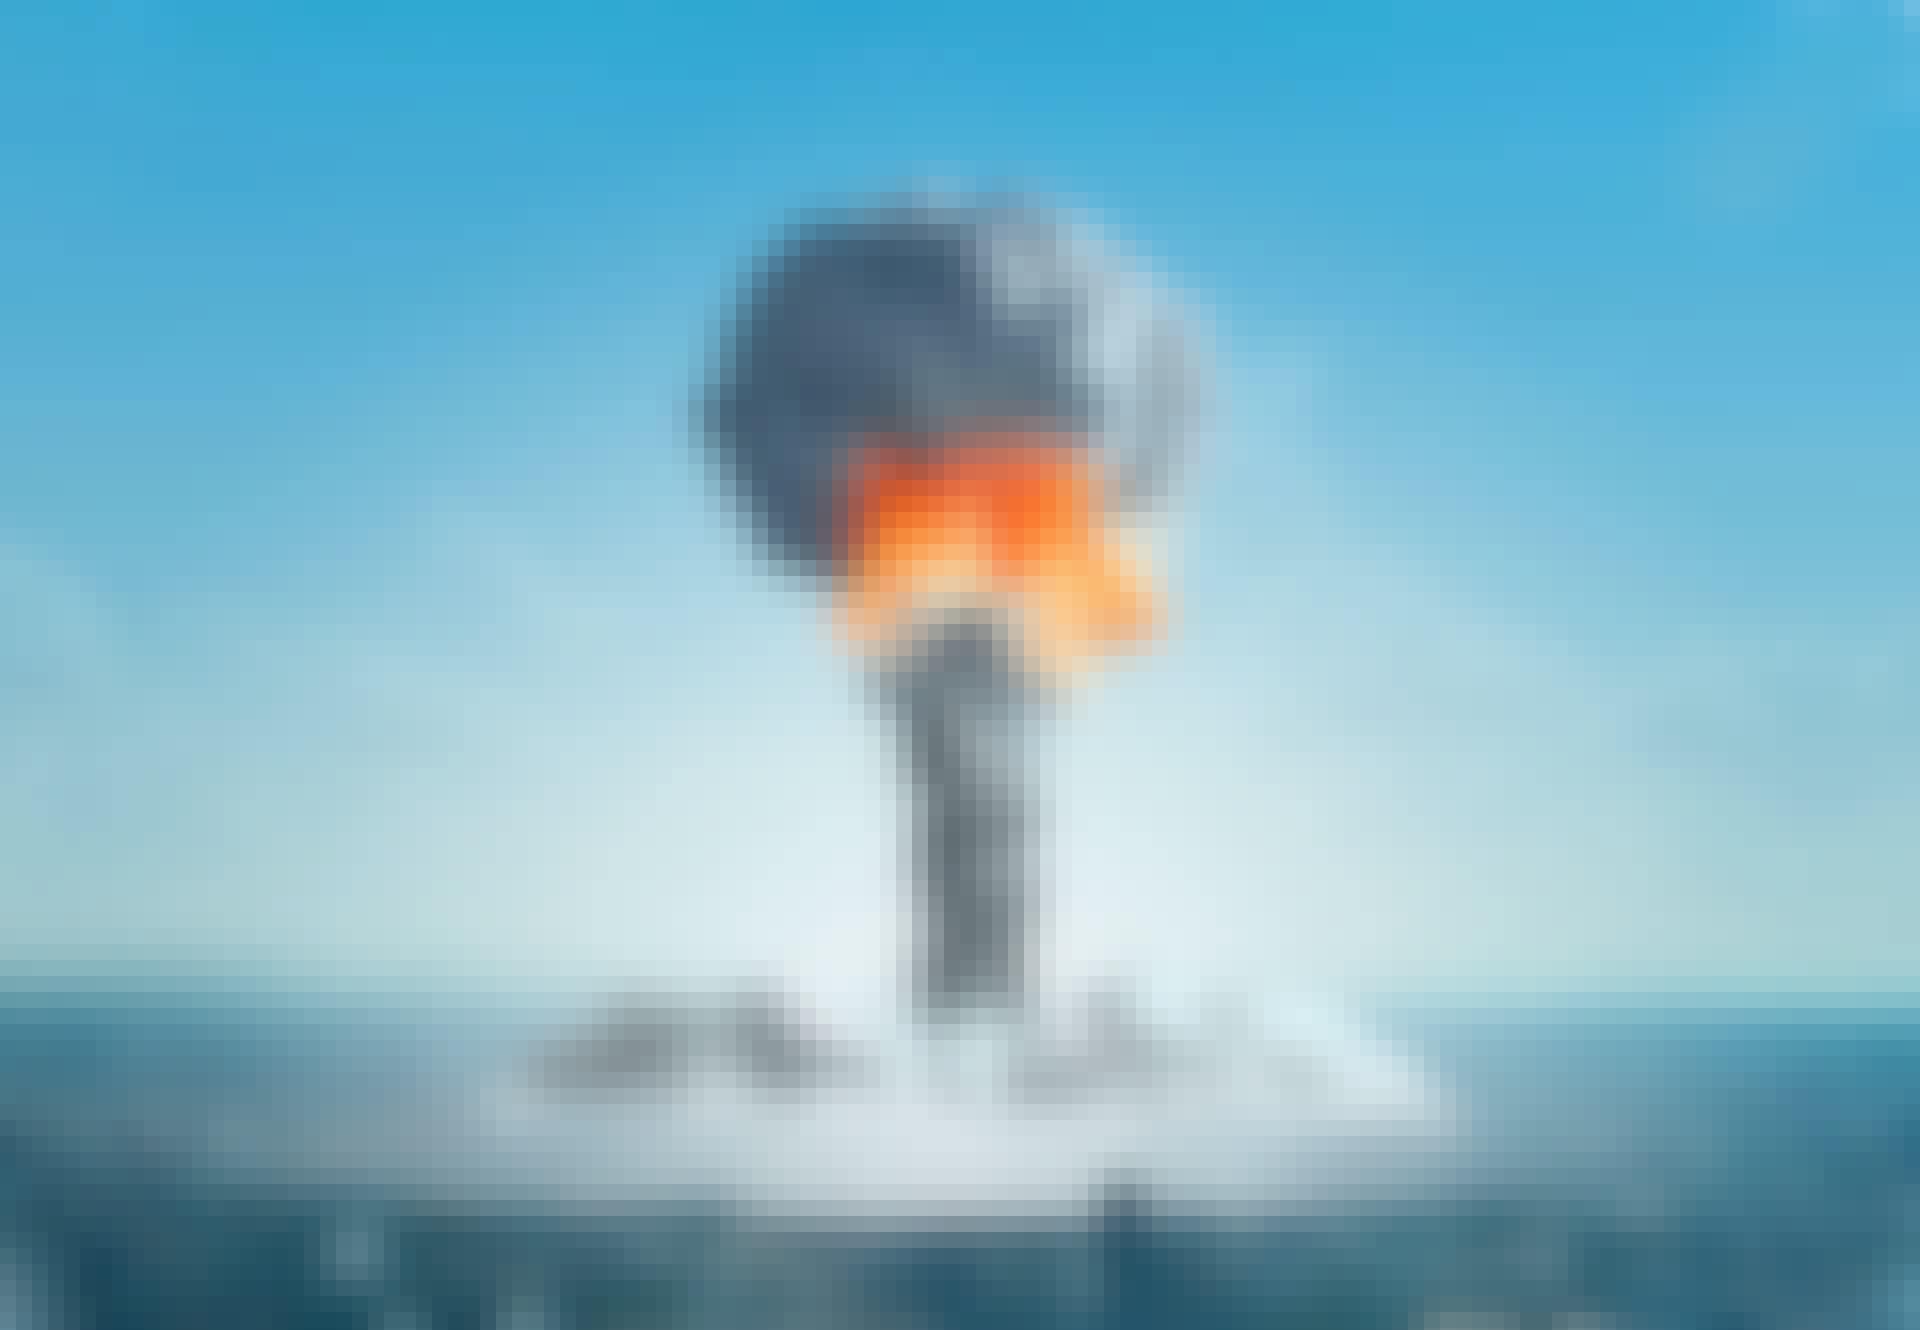 Atombombe by